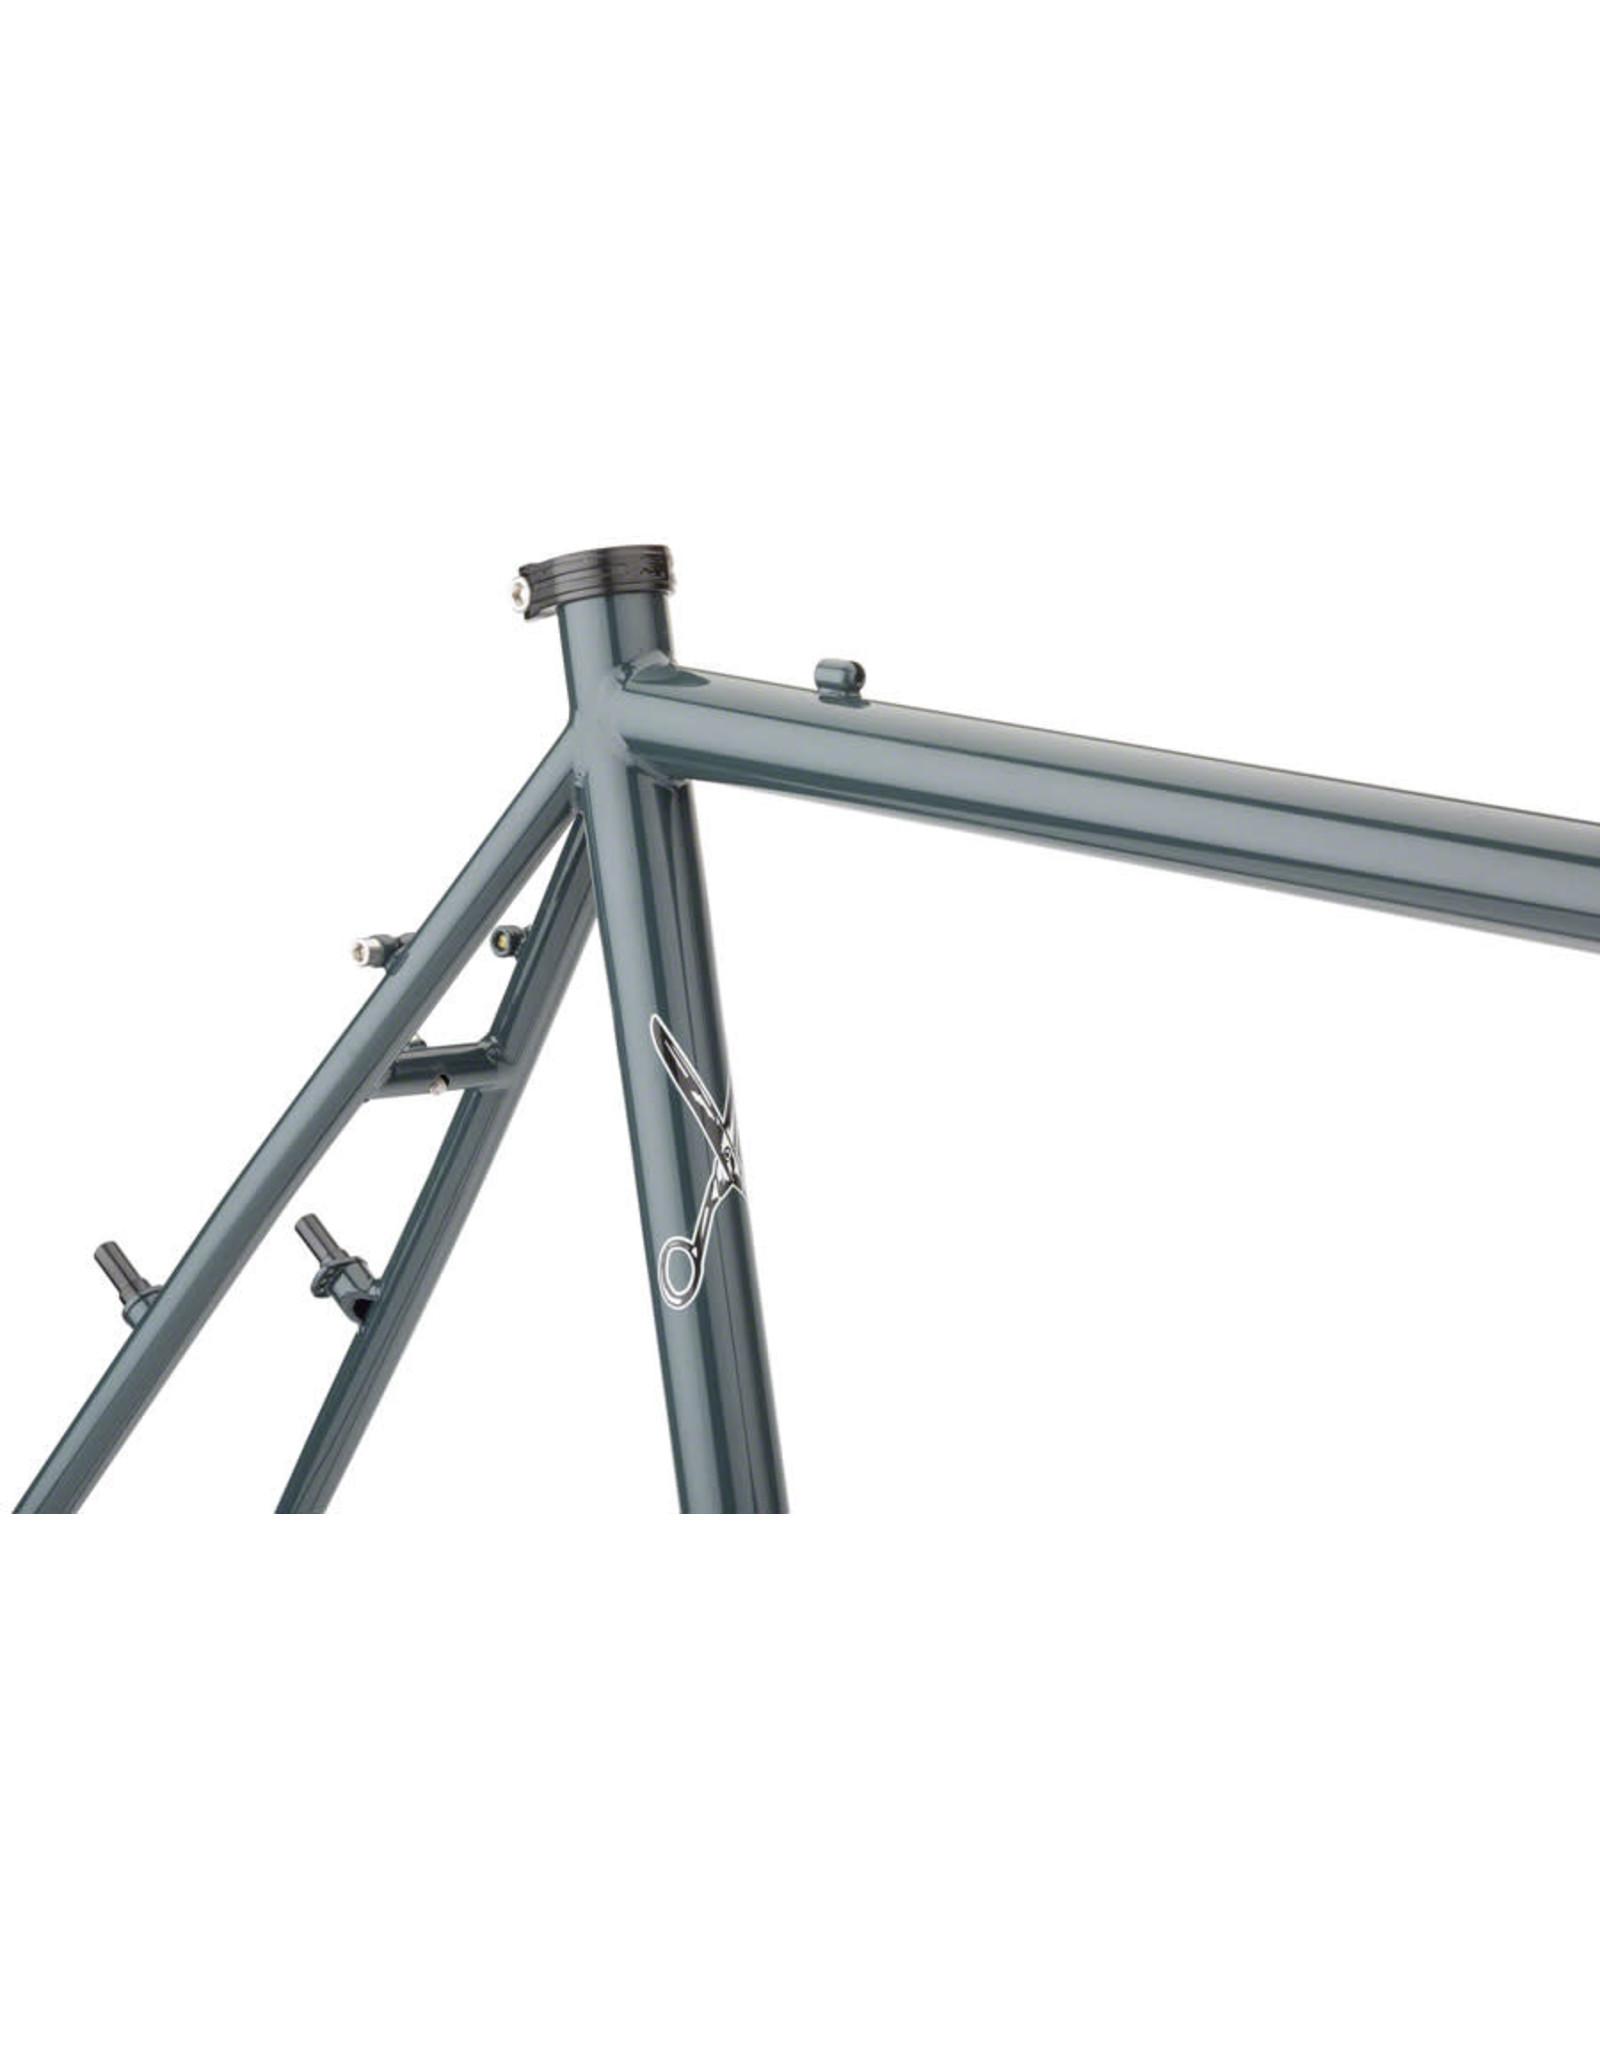 Surly Surly Cross-Check Frameset - 700c, Steel, BlueGreenGray